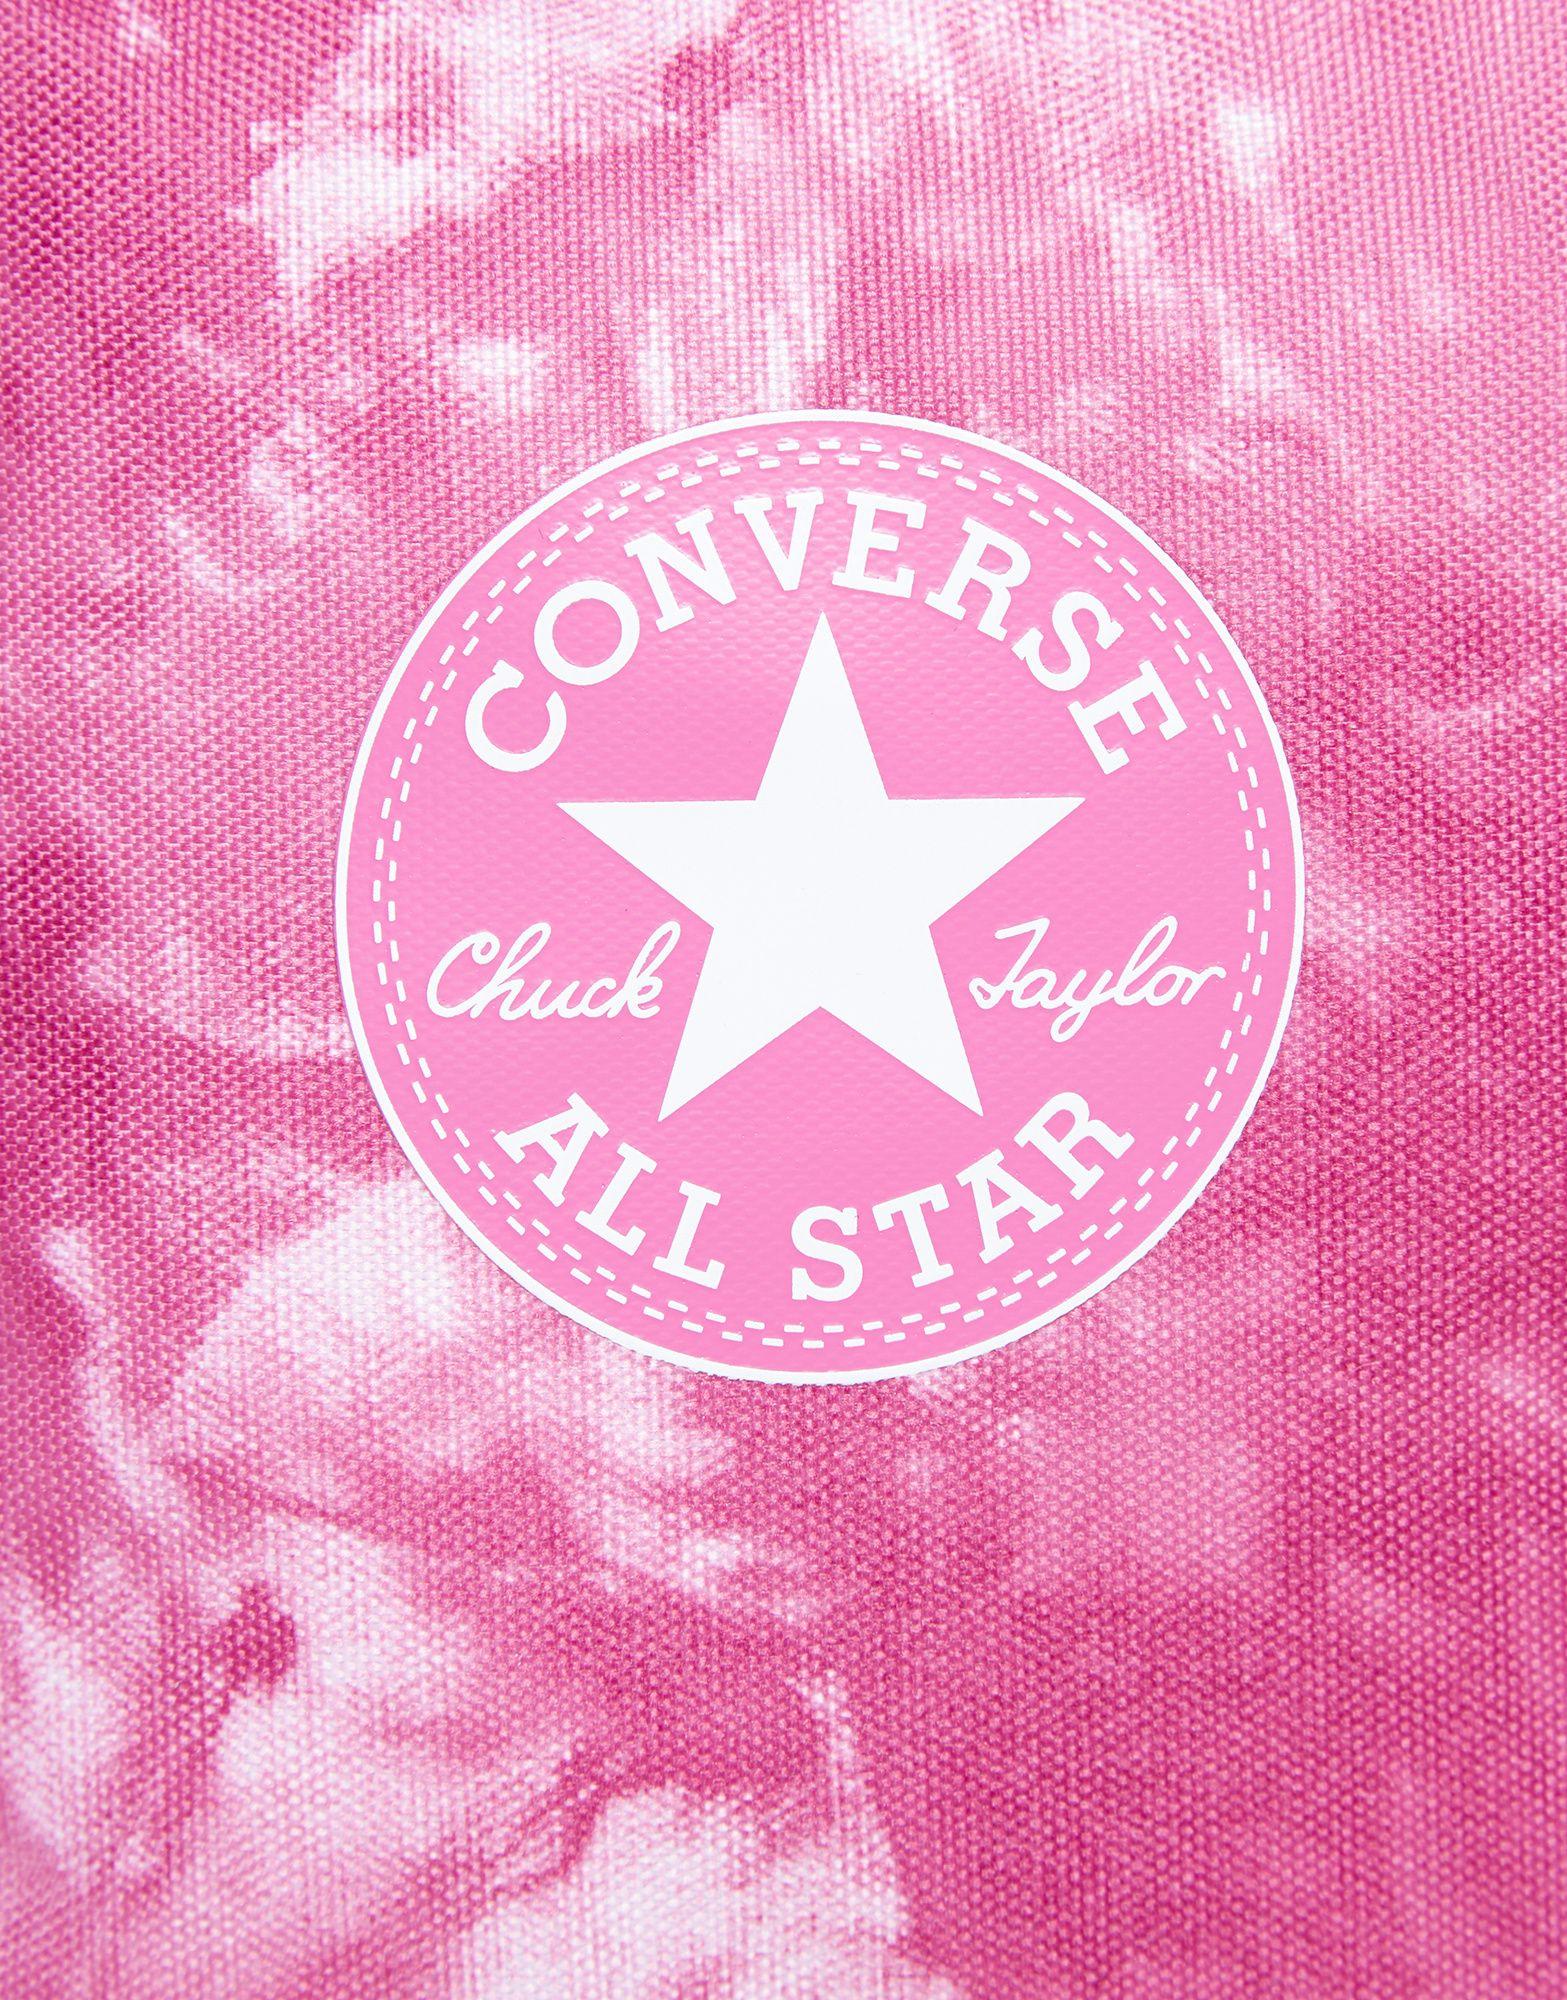 Converse Back To It Backback